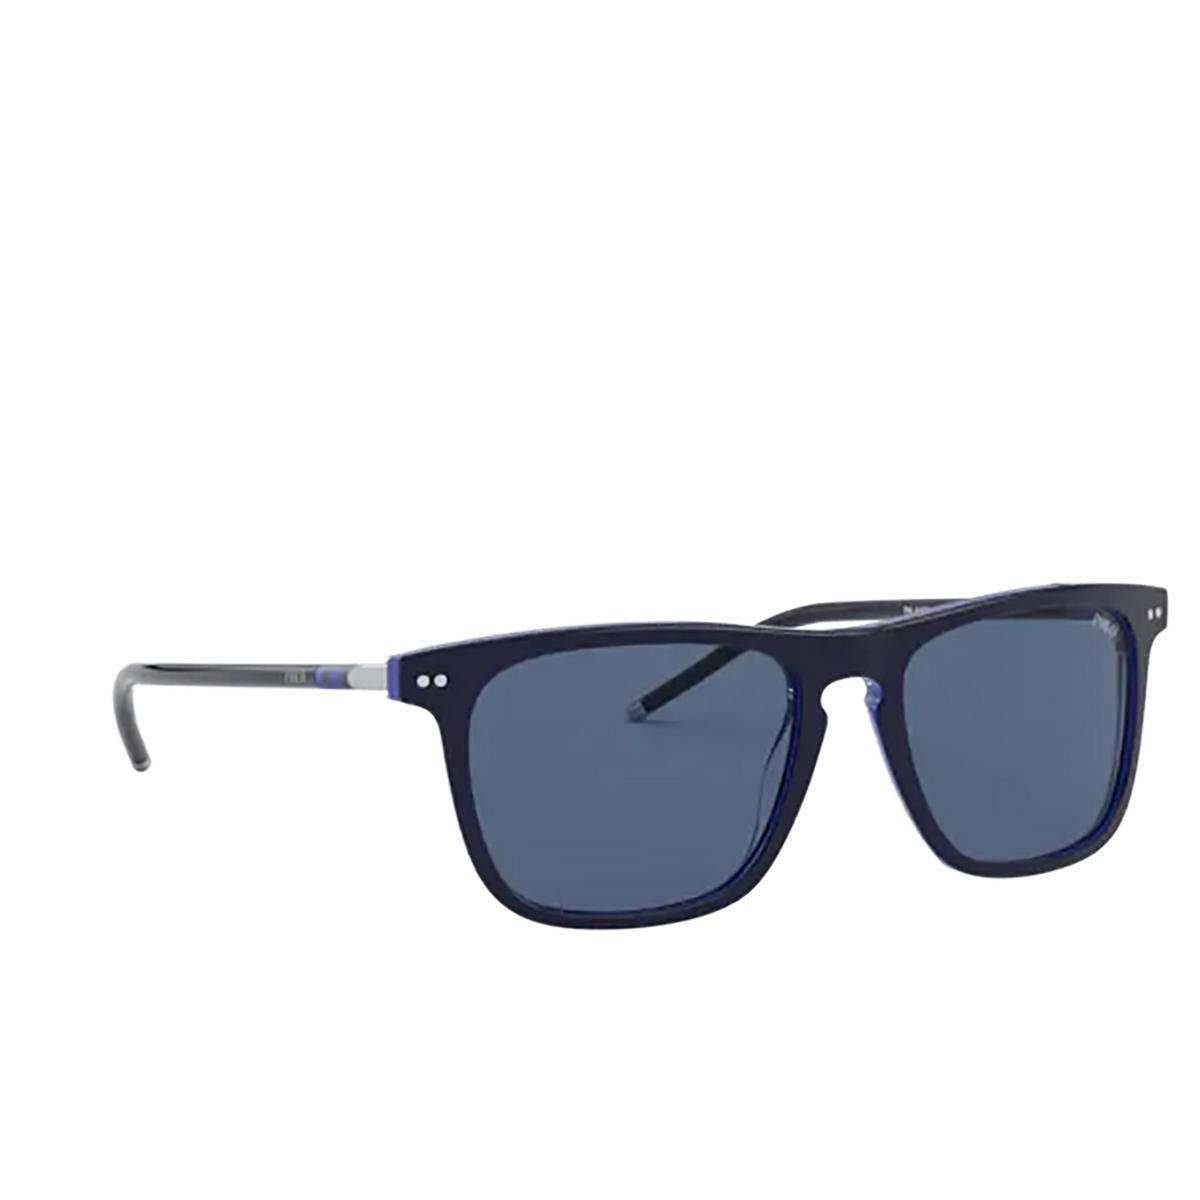 Polo Ralph Lauren® Square Sunglasses: PH4168 color Shiny Navy Blue On Royal Blue 586580.